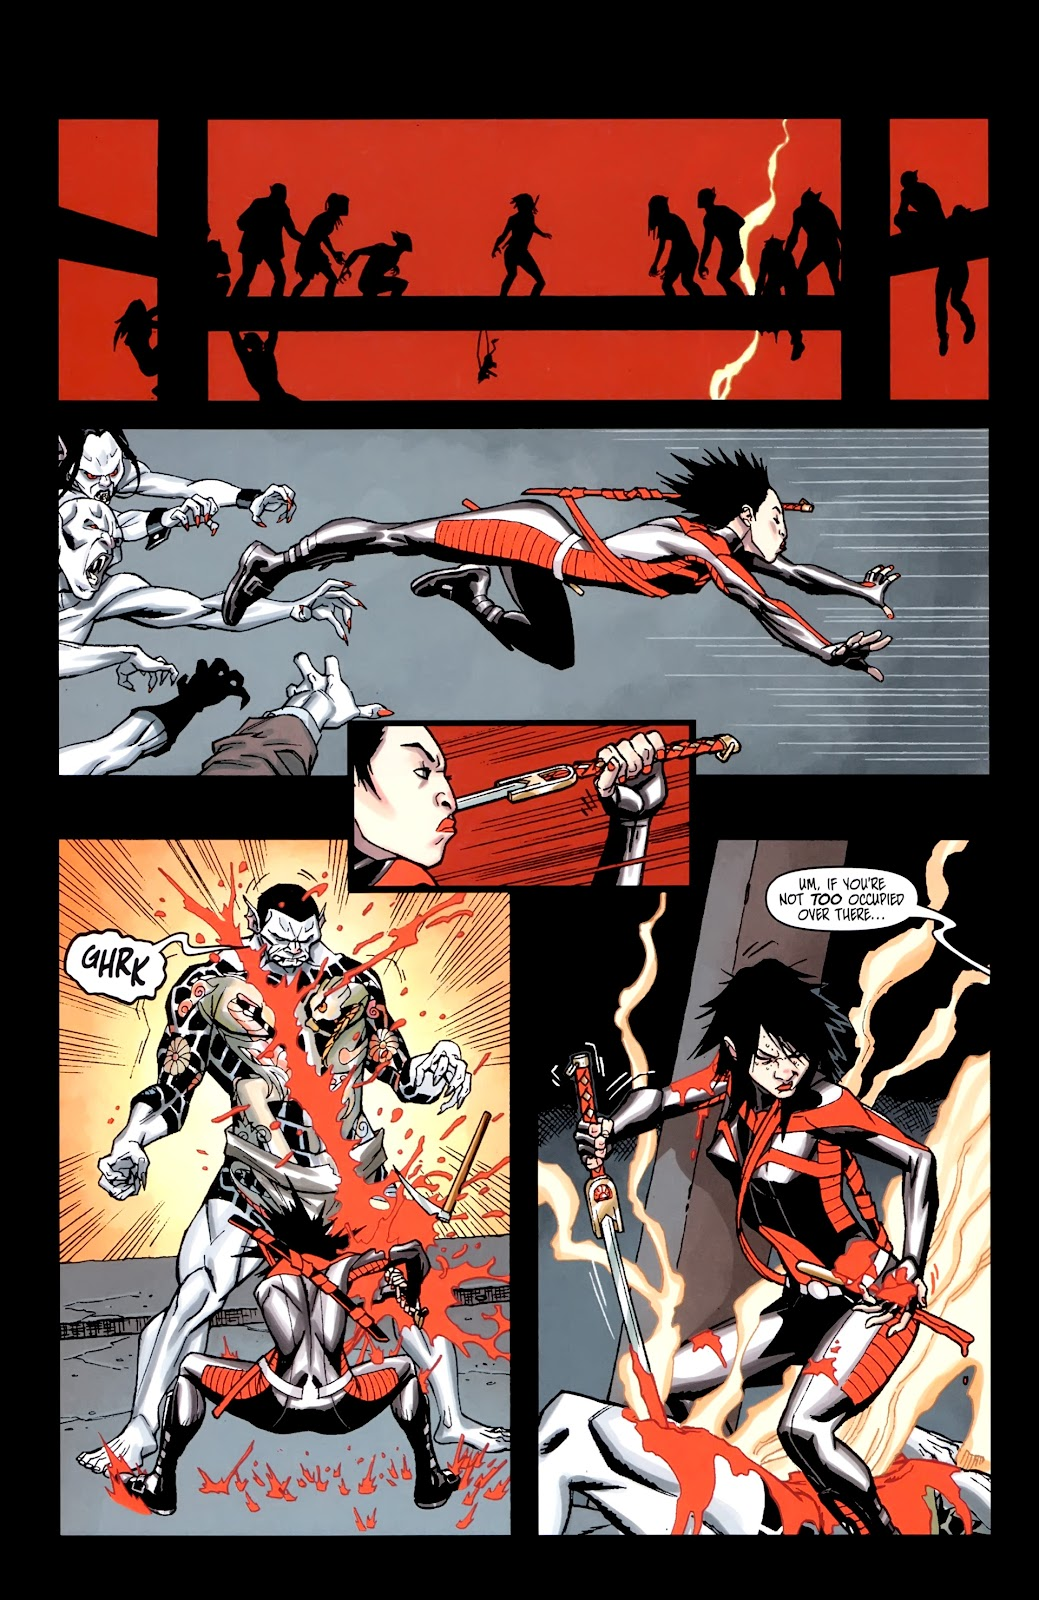 Read online Shinku comic -  Issue #5 - 15